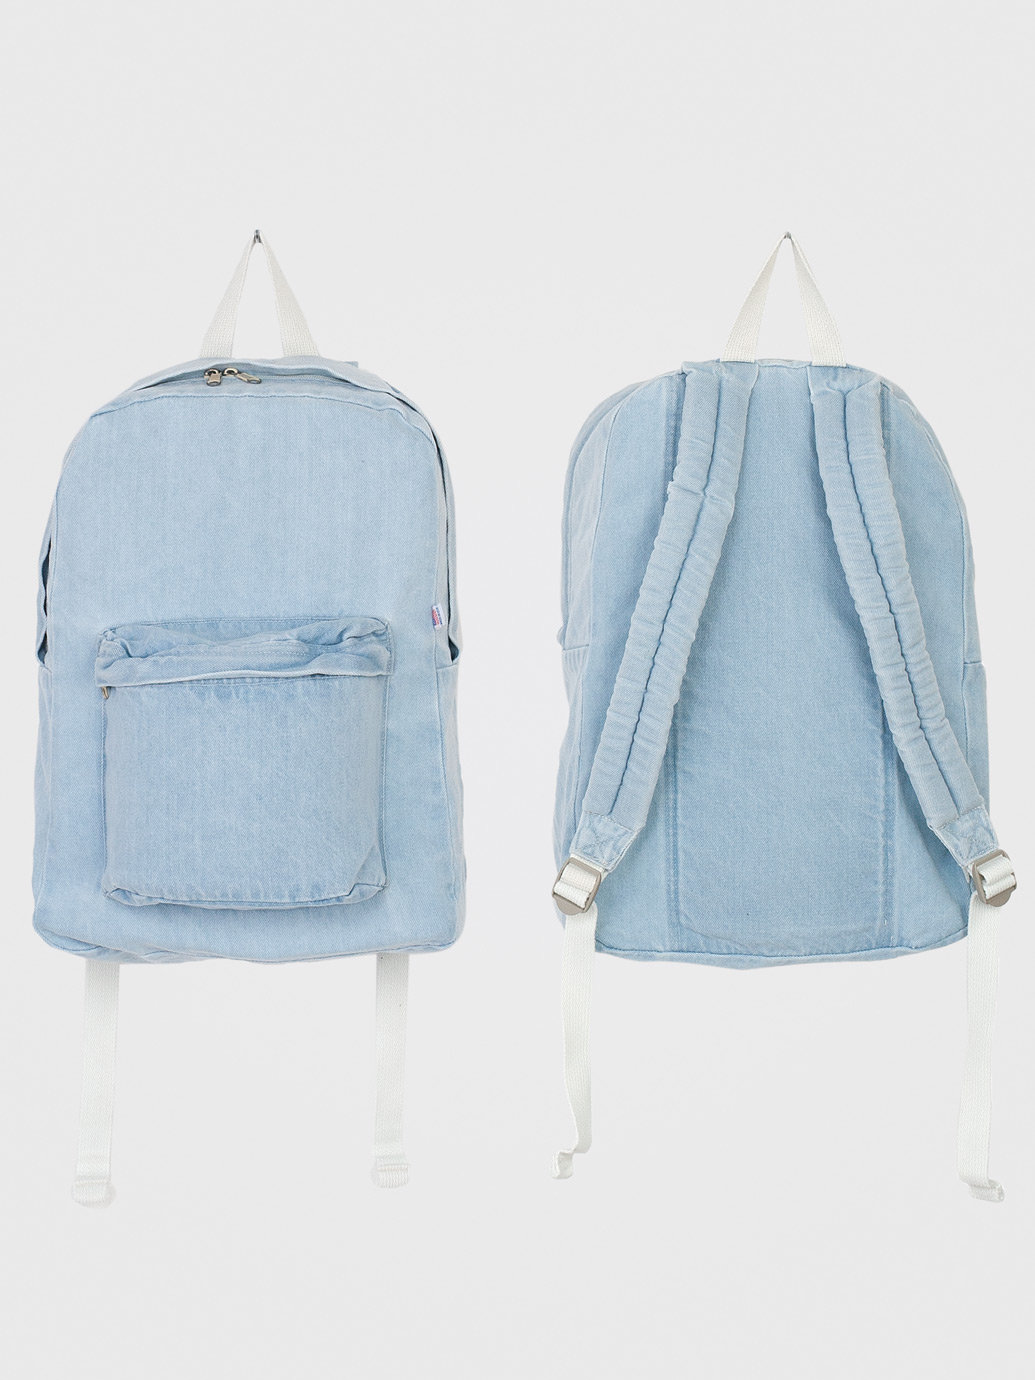 A Magical Girlsu0026#39;s Guide to Life u2665 u2661 Cute Back To School Essentials Backpacks u2661